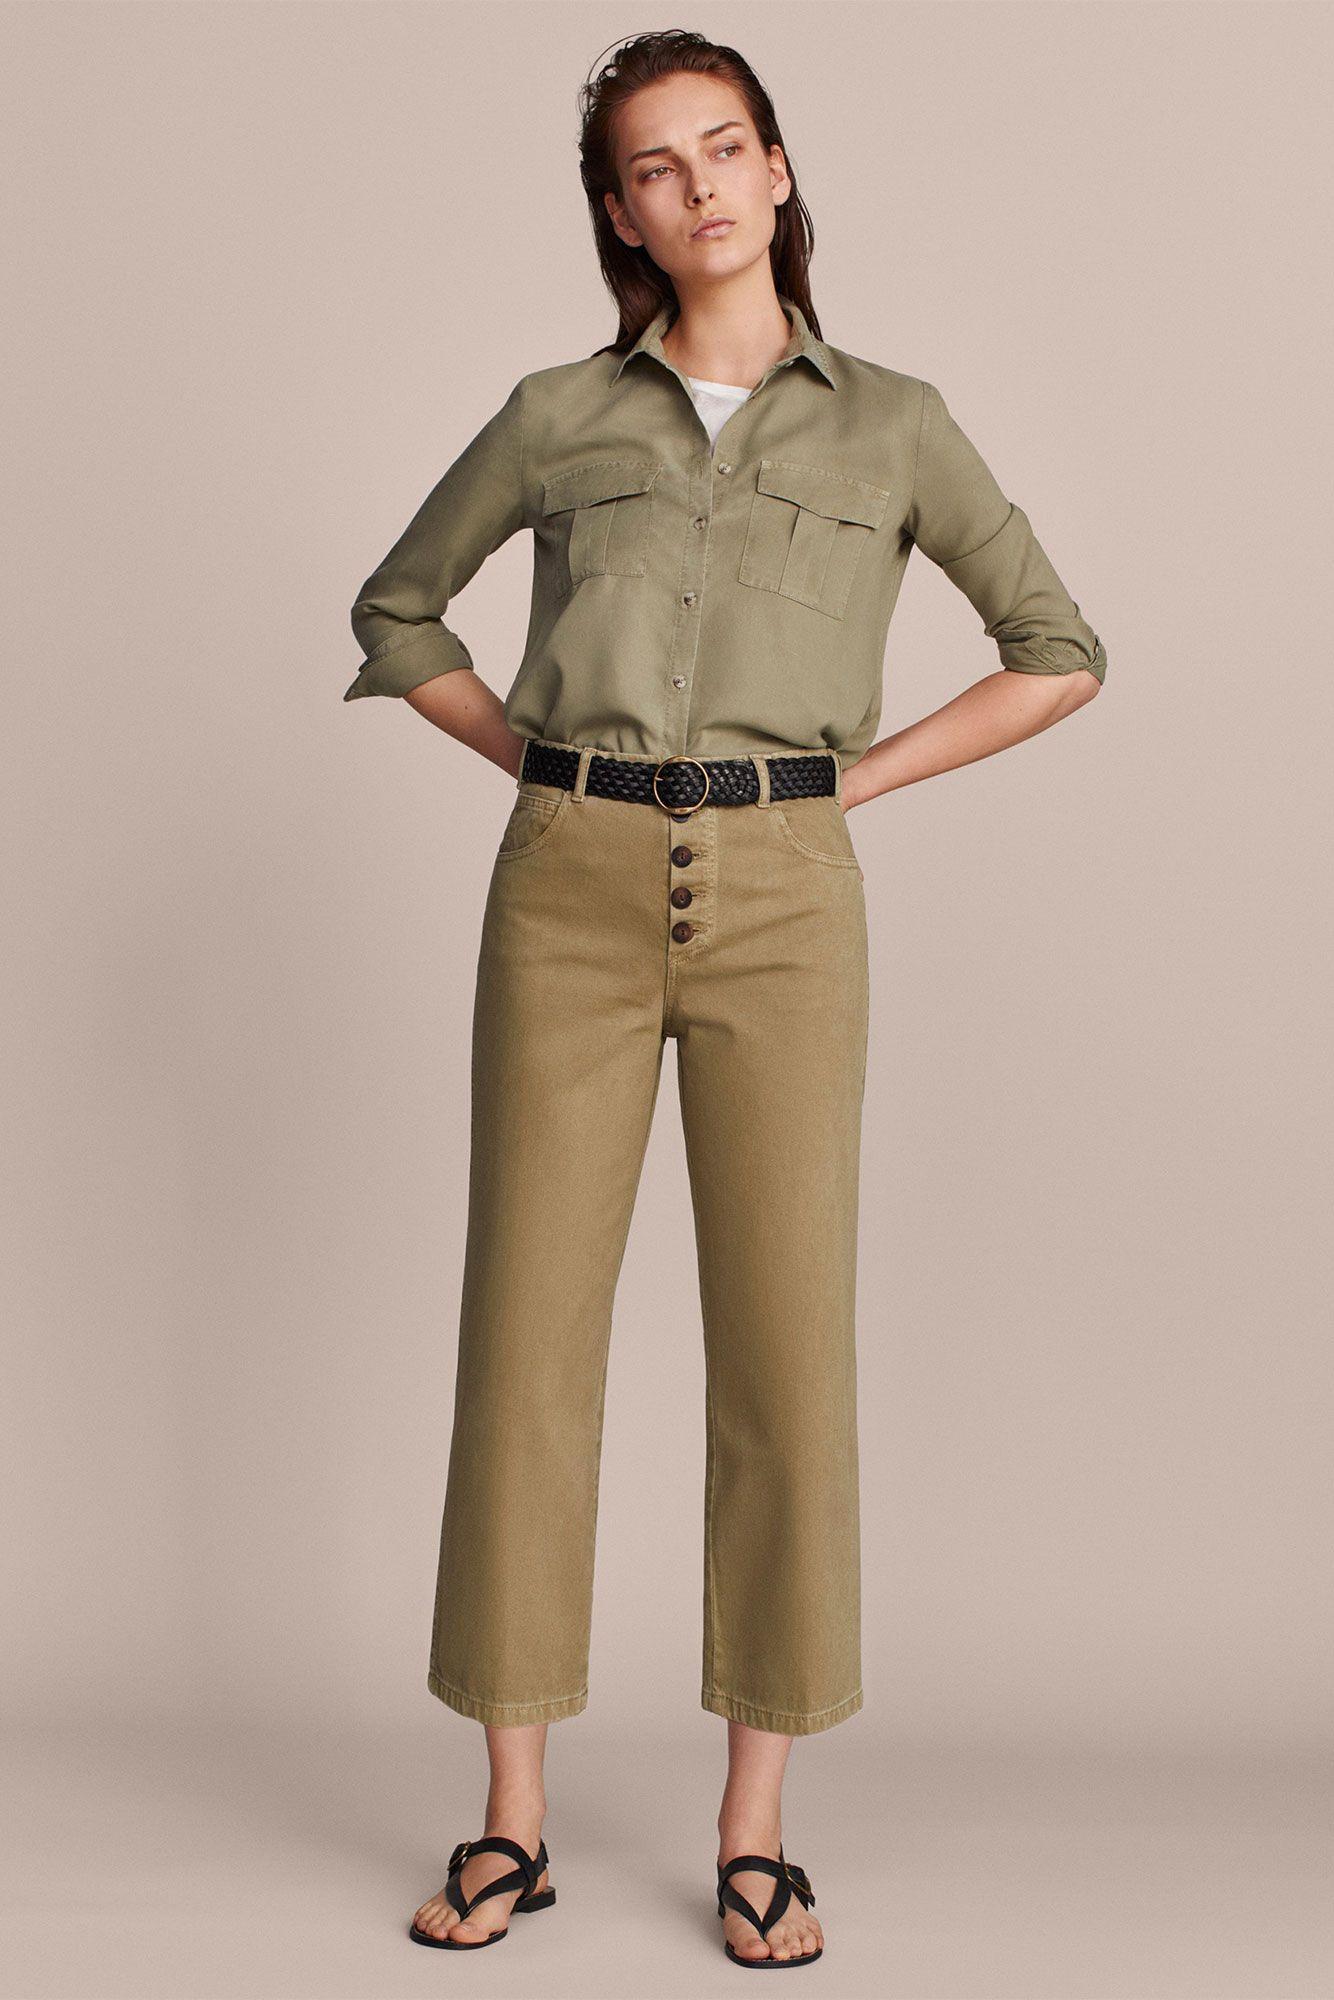 Este pantalón culotte de Massimo Dutti es la tendencia del otoño